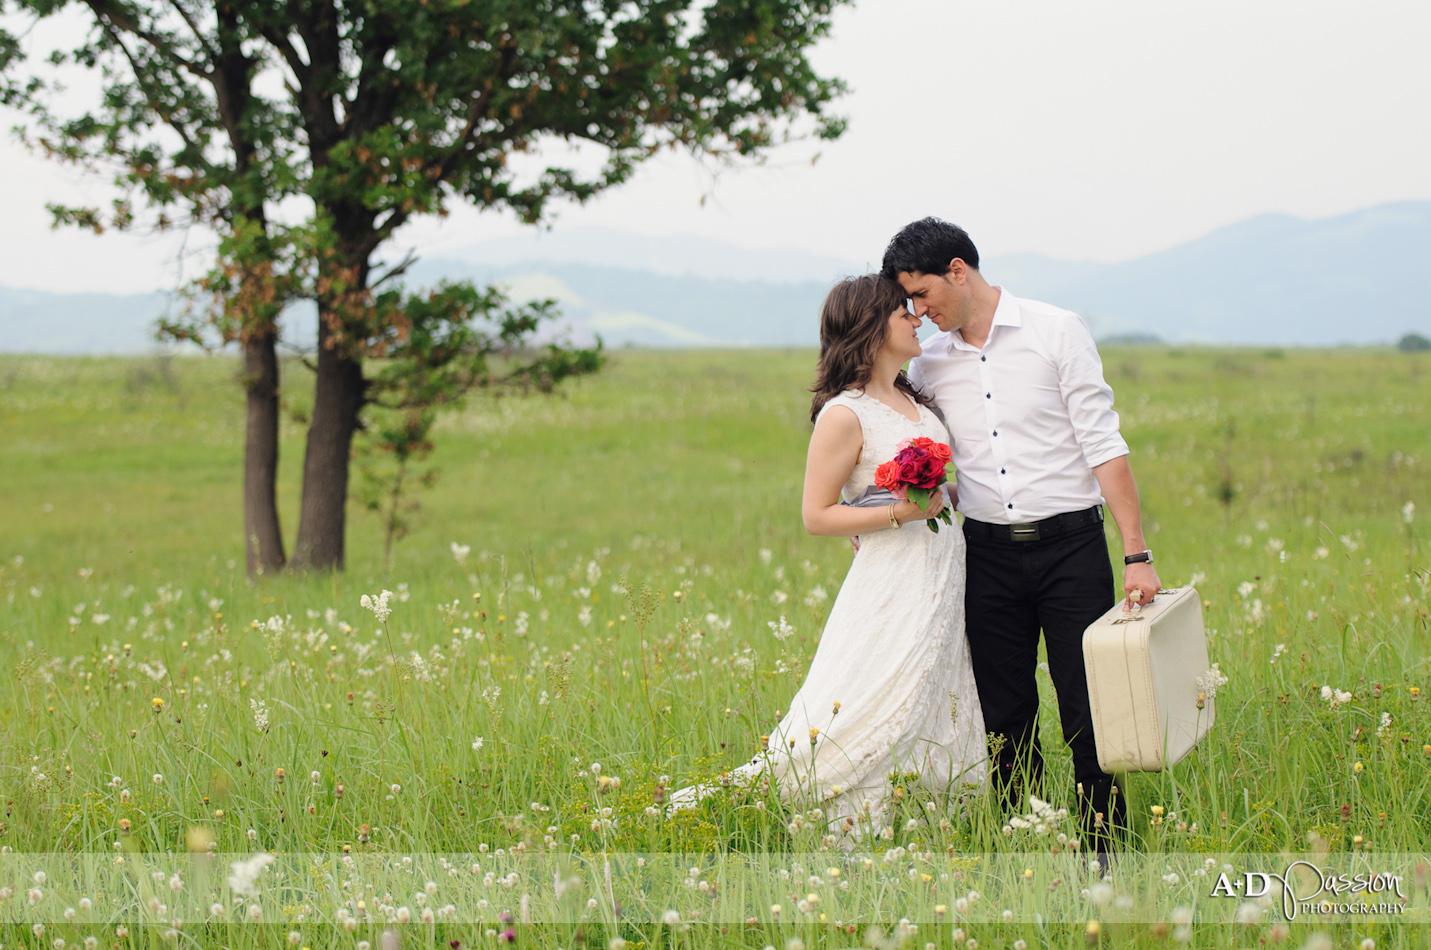 AD Passion Photography | 07042012_fotograf-profesionist-nunta_after-wedding_carmen-si-costi_0022 | Adelin, Dida, fotograf profesionist, fotograf de nunta, fotografie de nunta, fotograf Timisoara, fotograf Craiova, fotograf Bucuresti, fotograf Arad, nunta Timisoara, nunta Arad, nunta Bucuresti, nunta Craiova